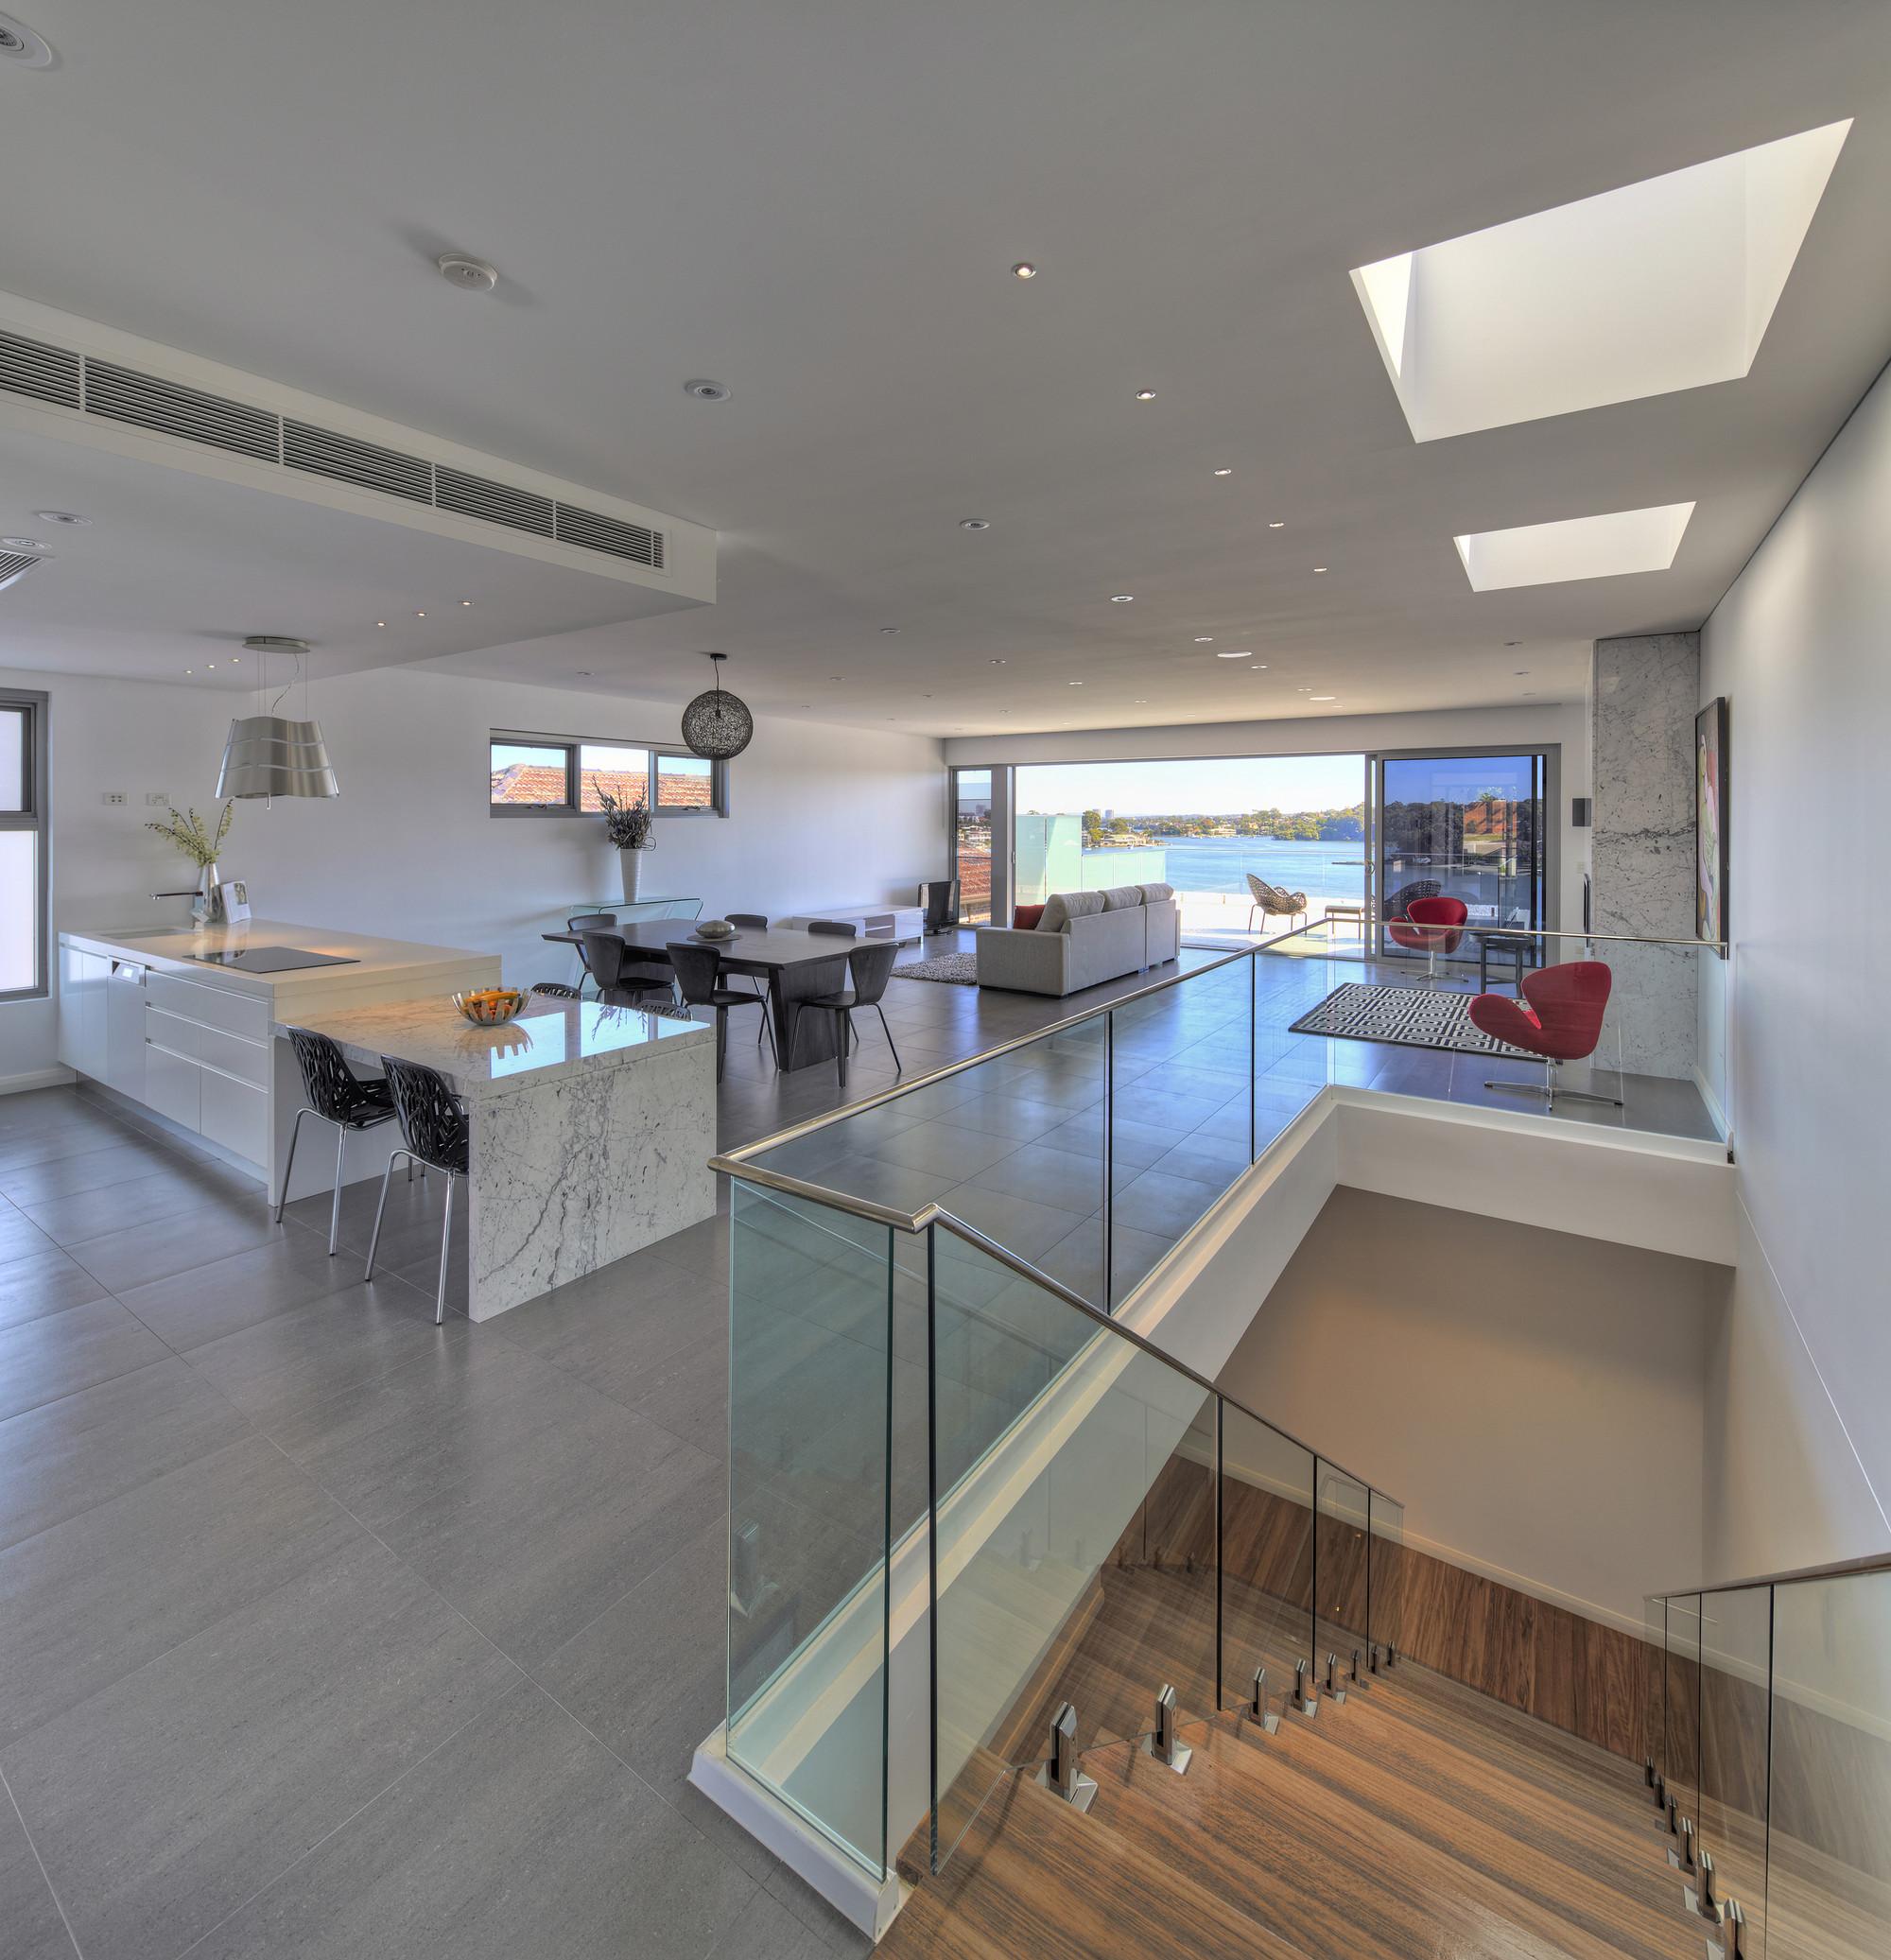 Chiswick Residence / Arki[vis]